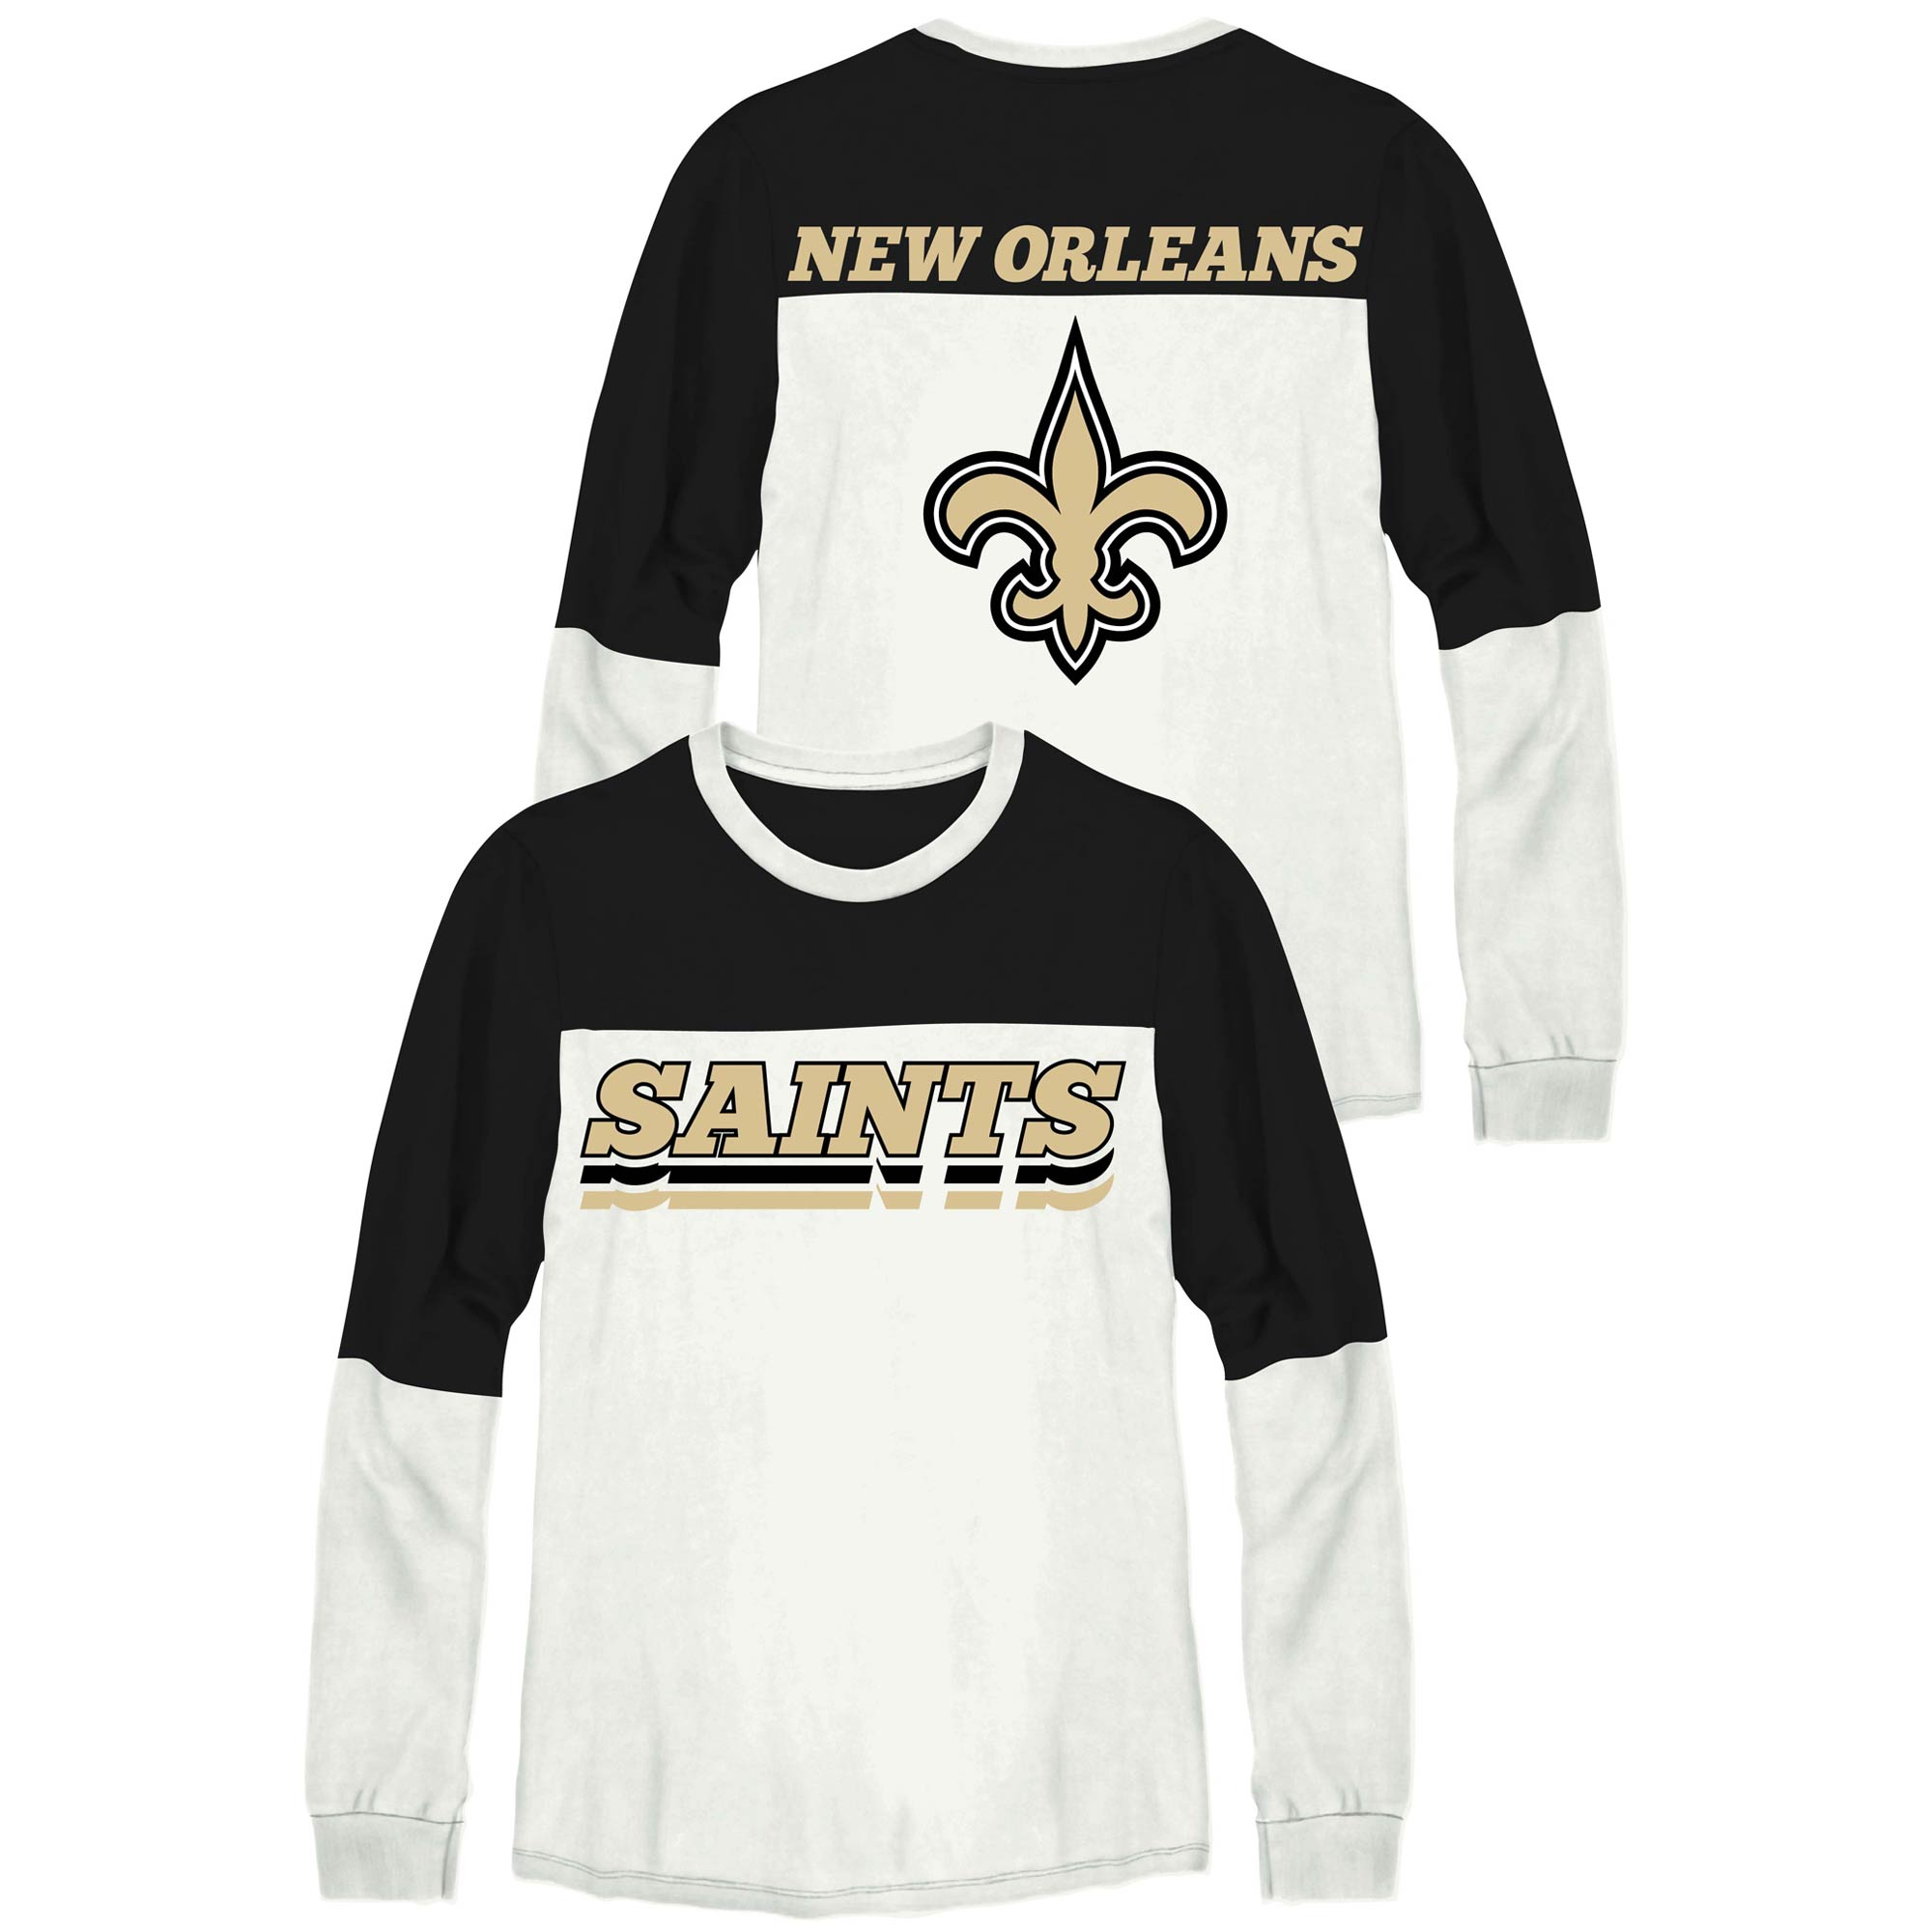 New Orleans Saints Junk Food Women's Comeback Long Sleeve T-Shirt - Black/White